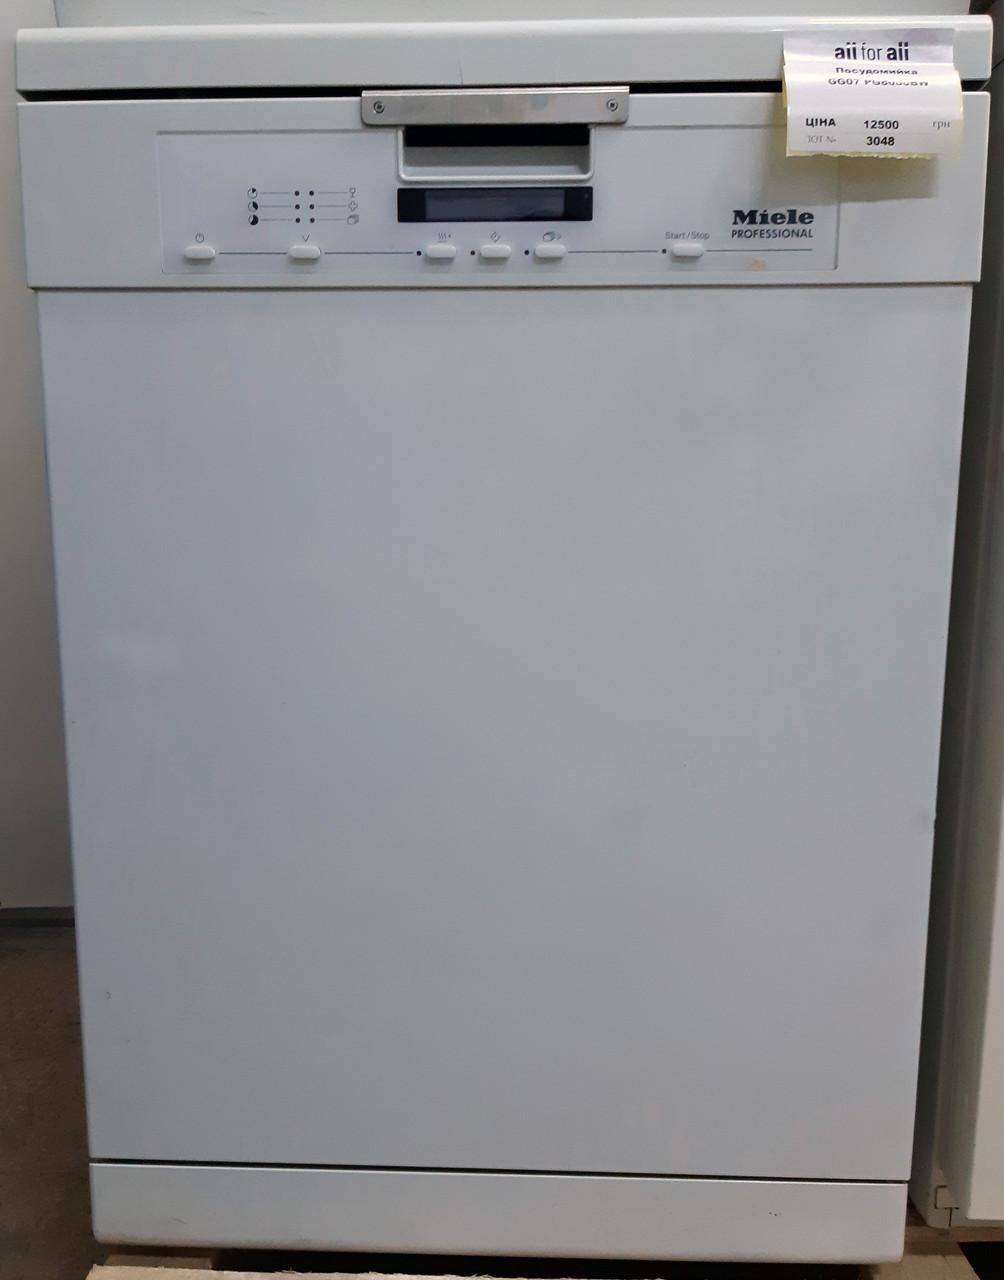 Посудомоечная машина Miele Professional PG 8080 BW